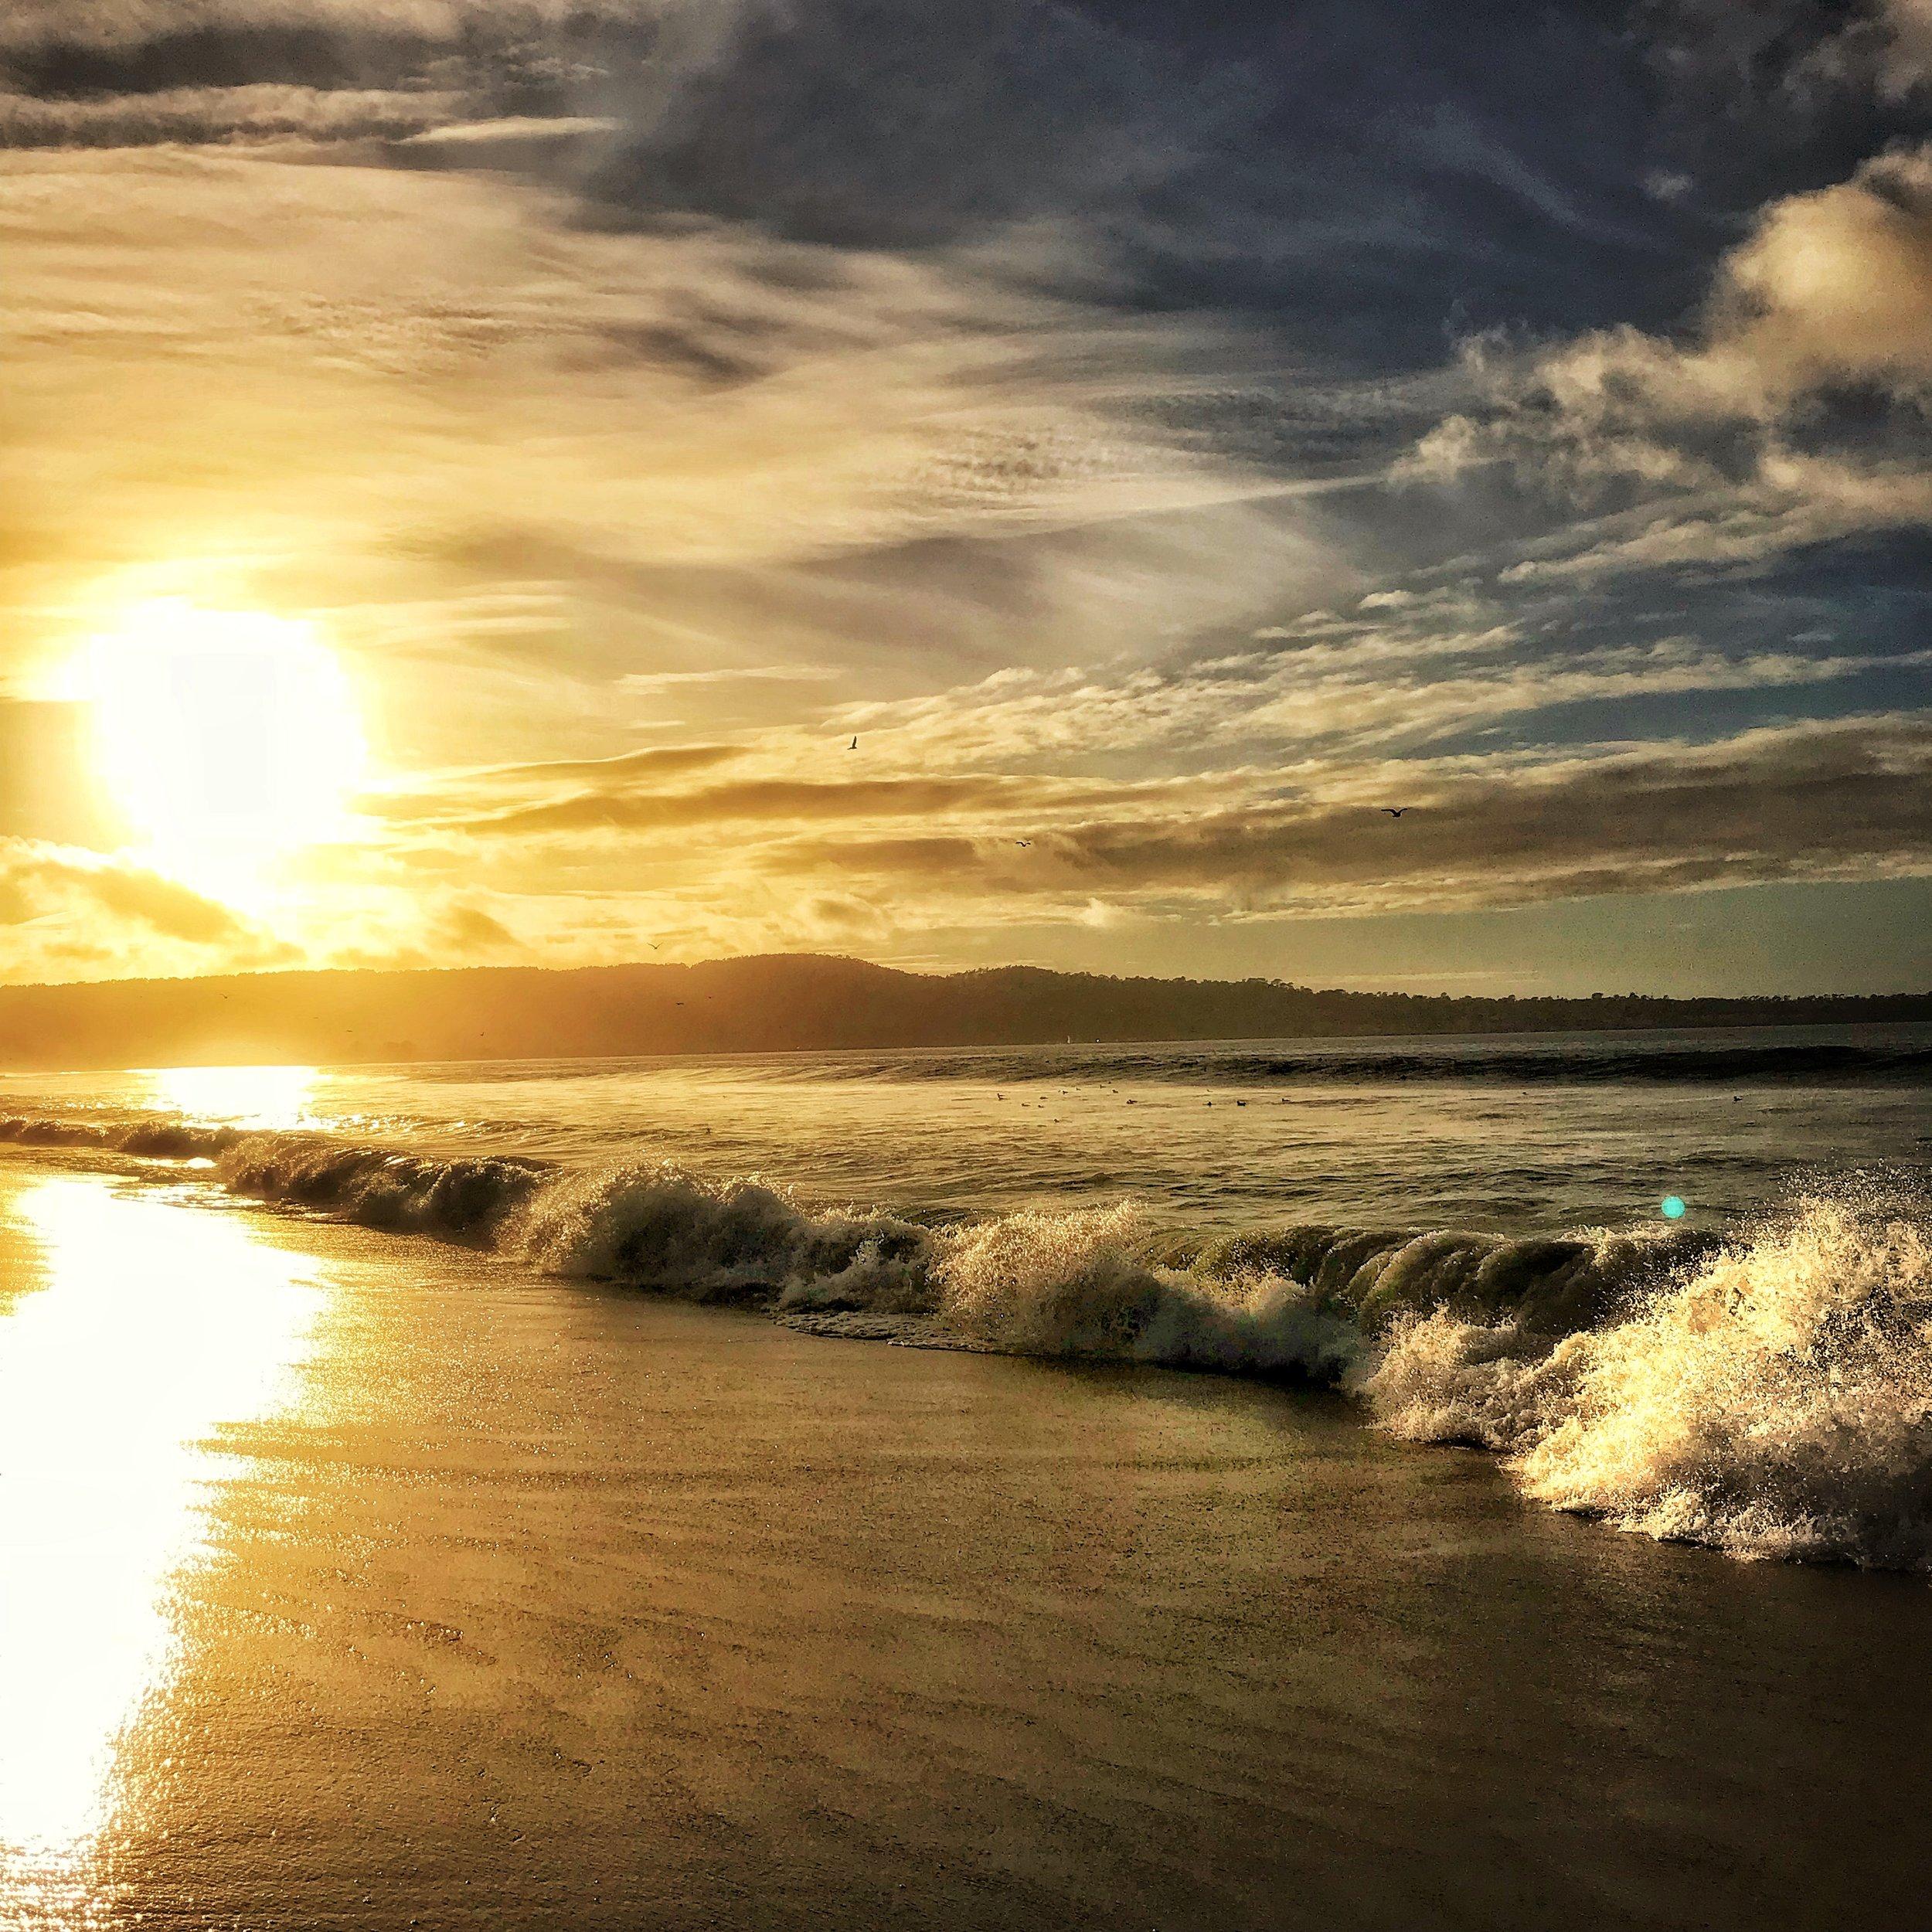 monterey bay at sunset